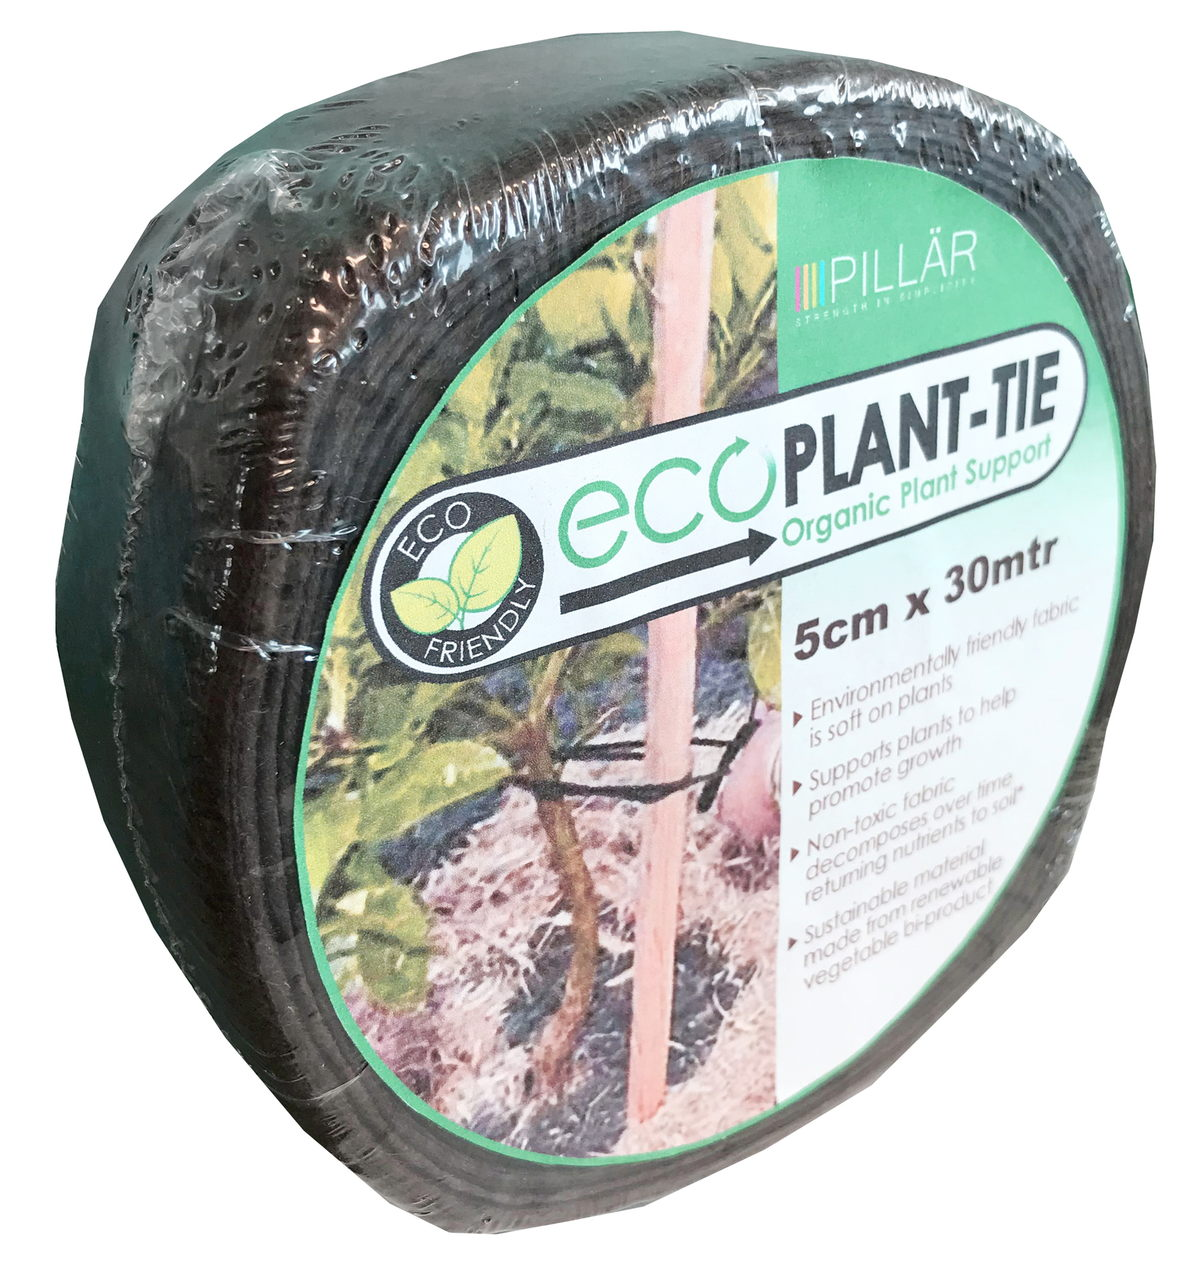 Eco Plant Ties Pillar Products